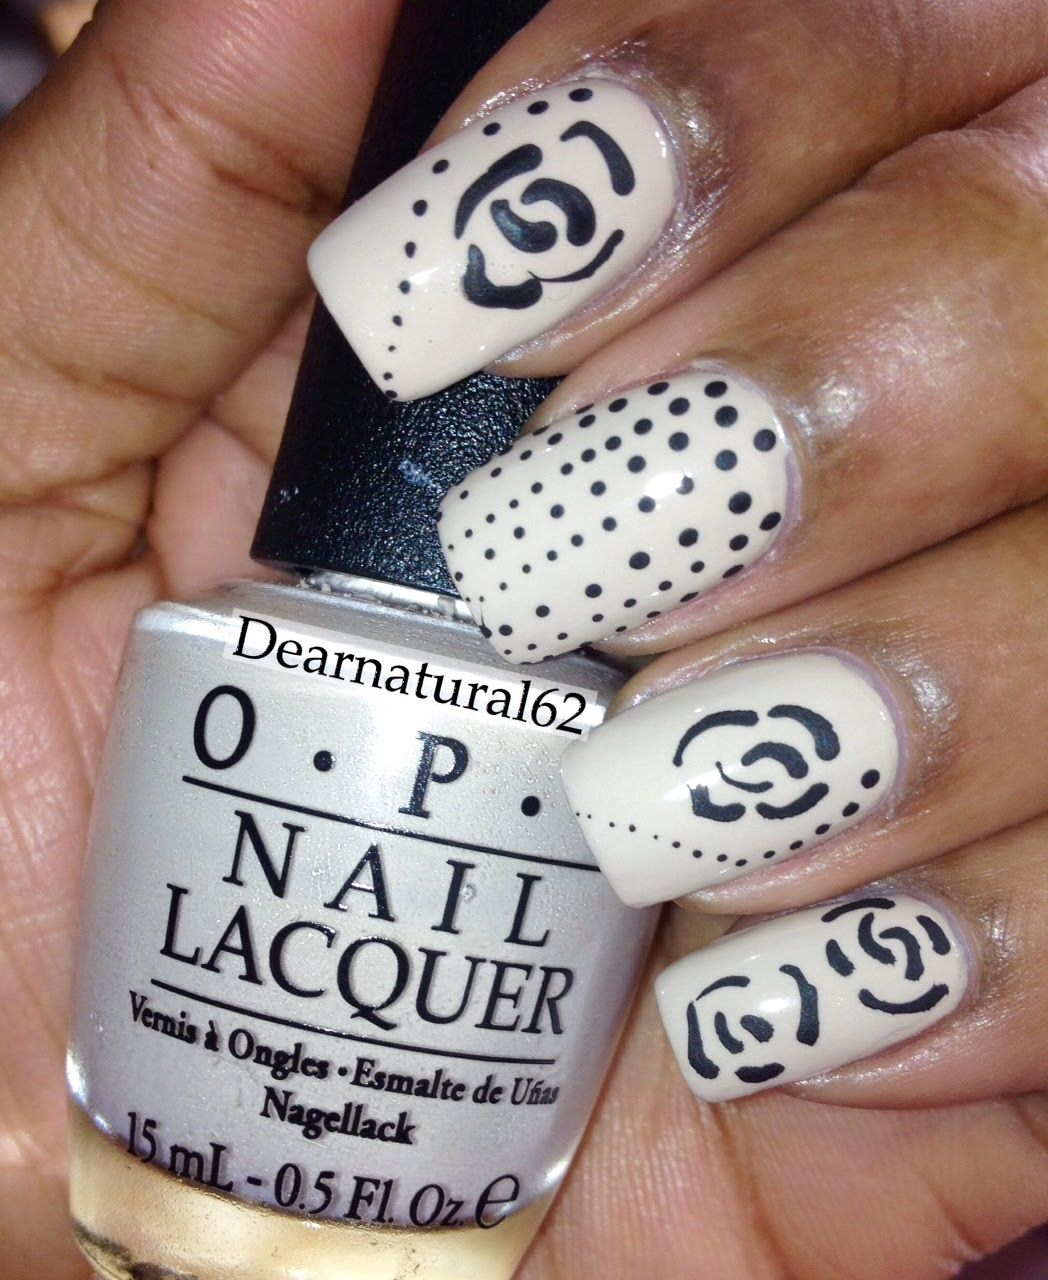 261 #NAILART | @OPI_Products Rose Tutorial